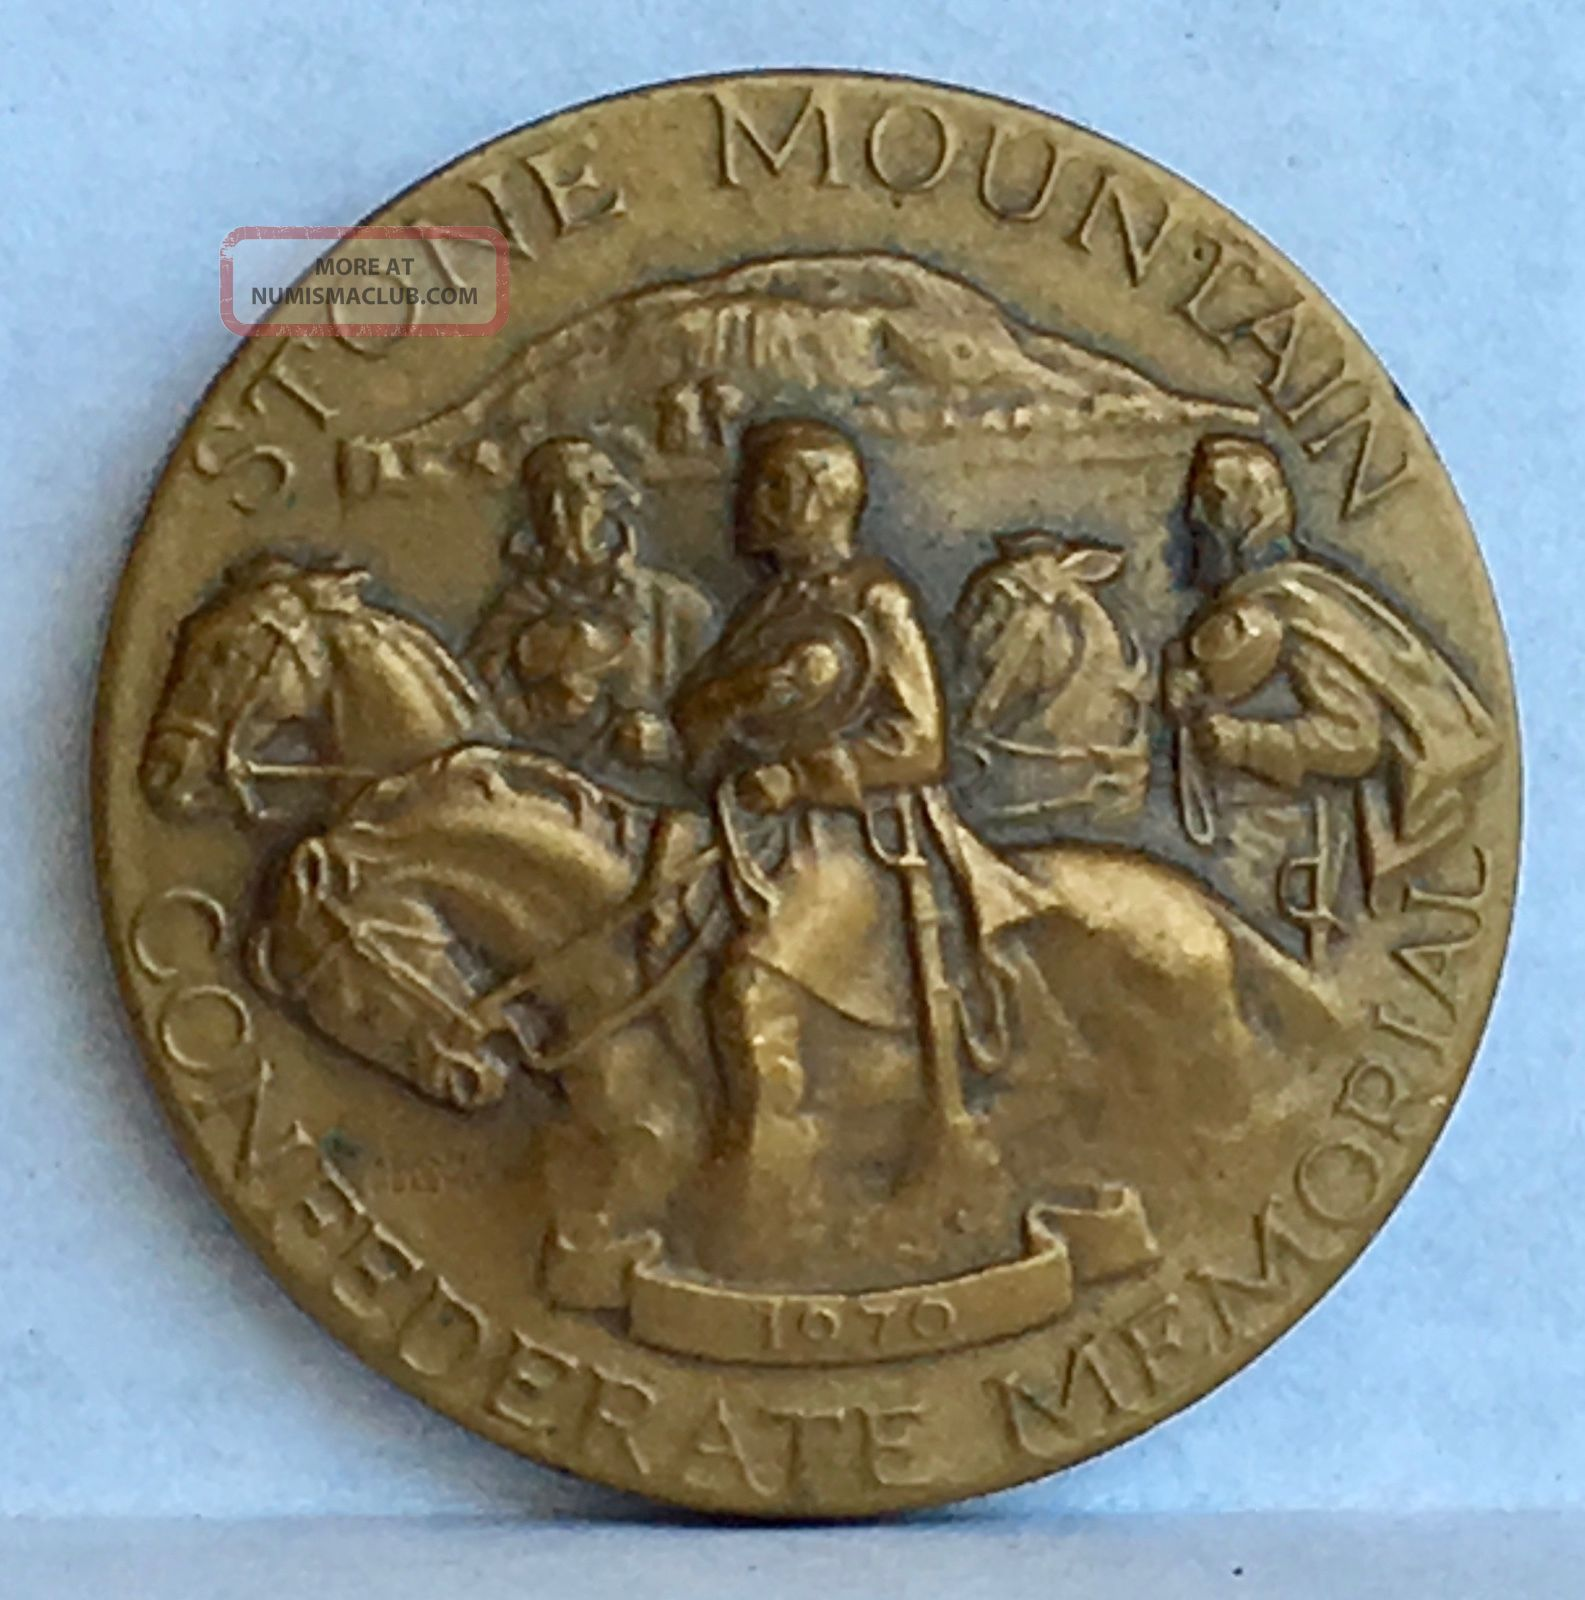 1970 Commemorative Medal Stone Mountain Confederate Memorial Medallic Art Bronze Exonumia photo